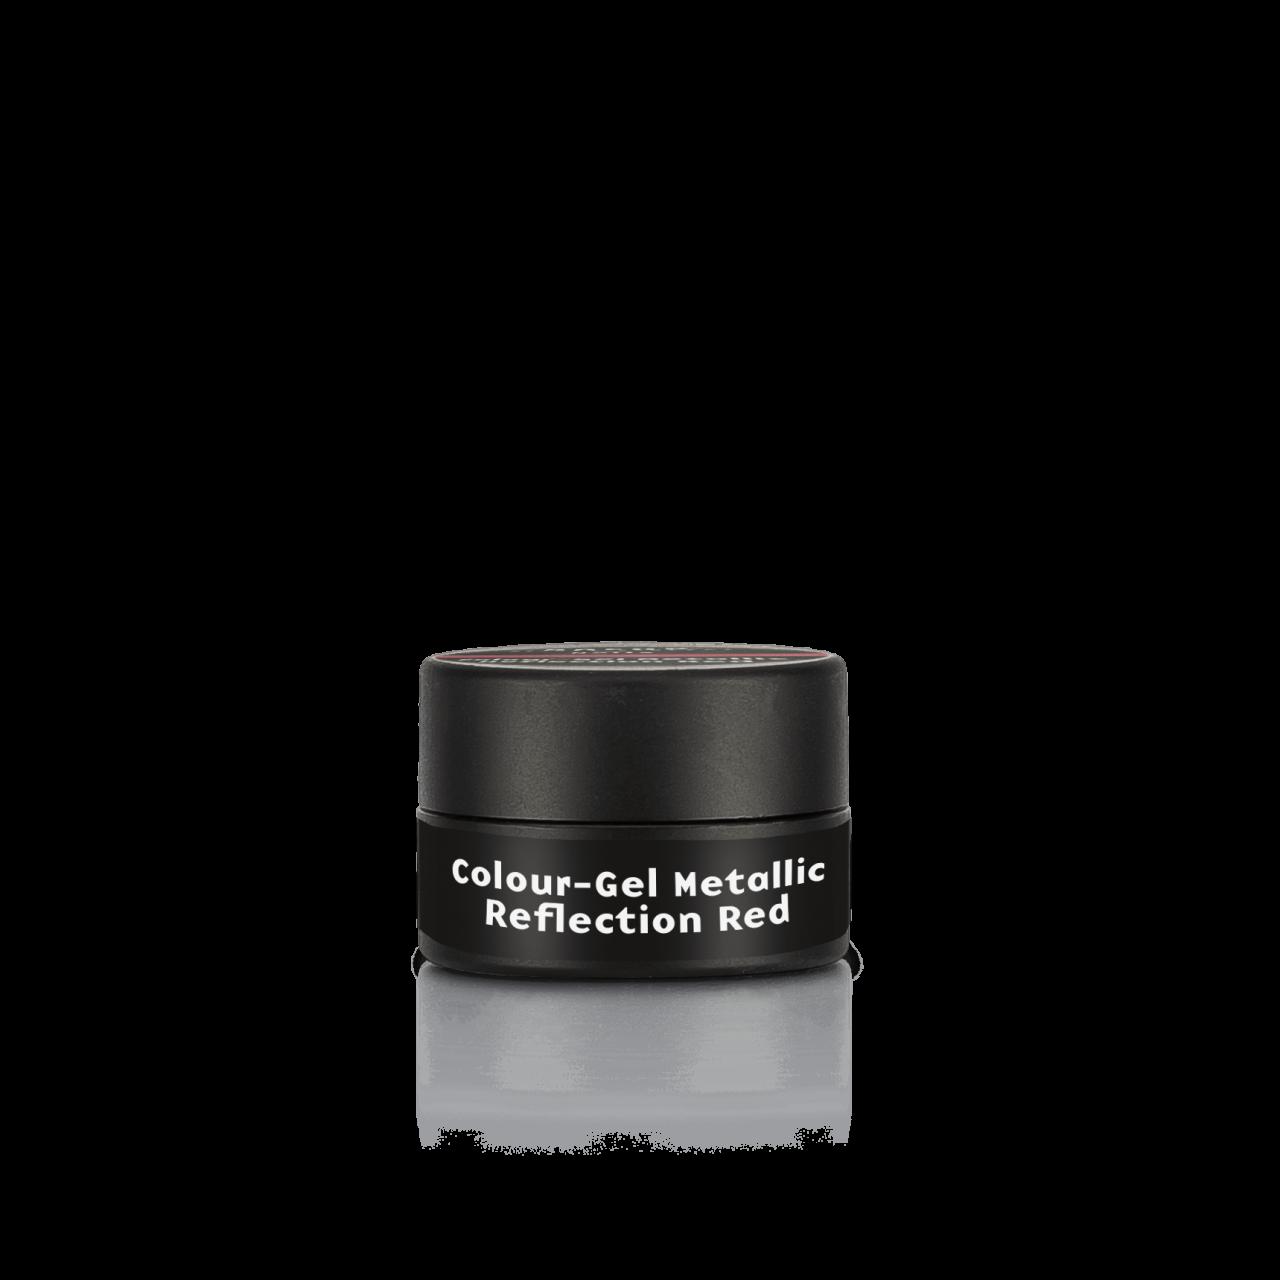 Colour-Gel Metallic Reflection Red 5 ml